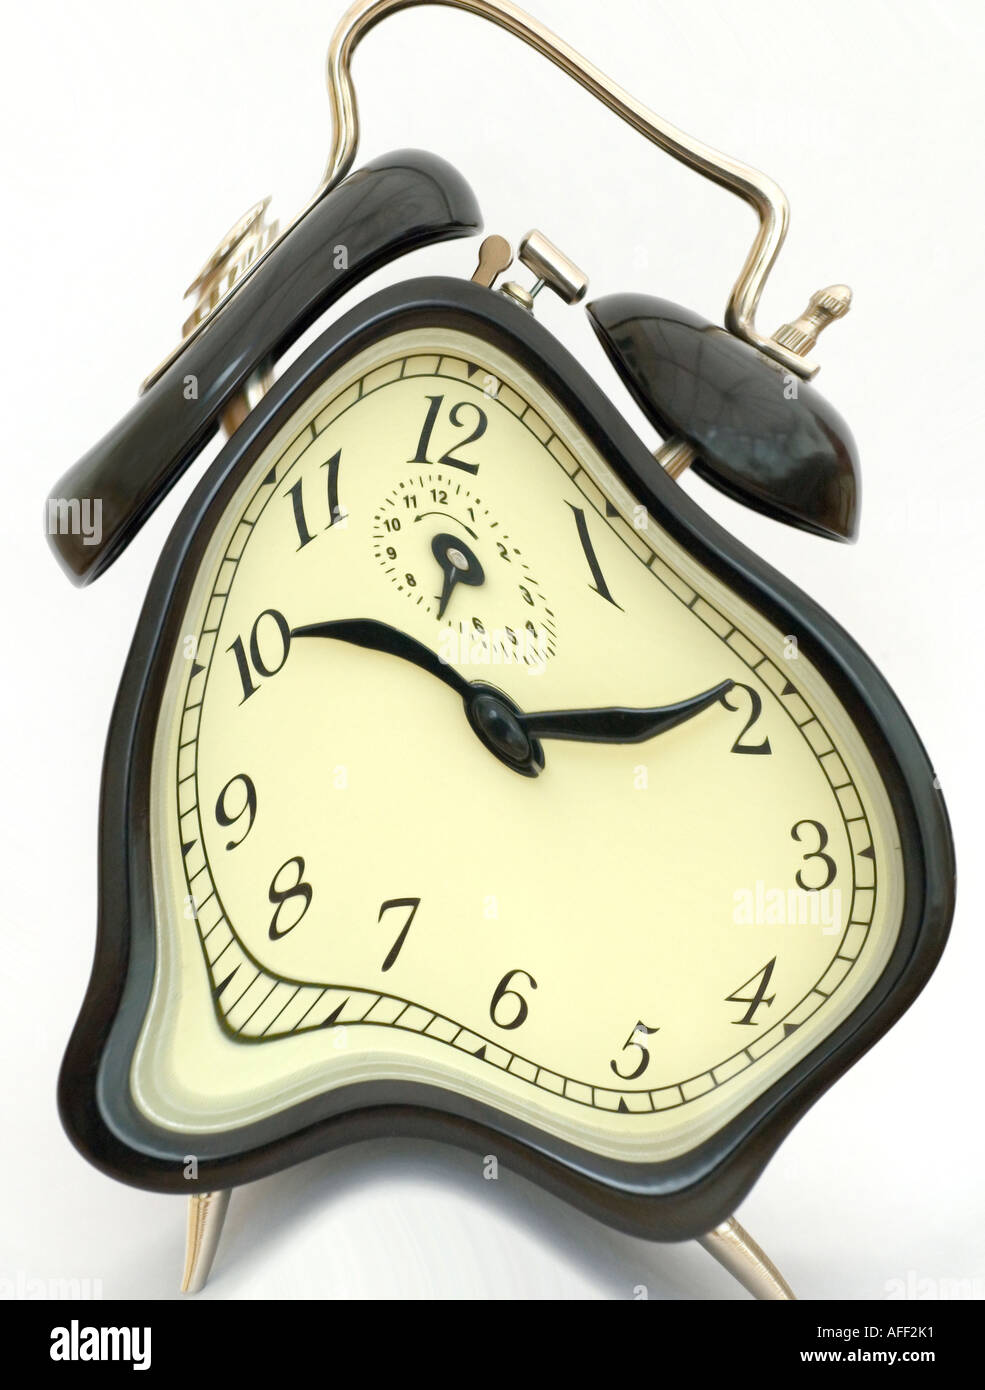 Warped Alarm Clock - Stock Image